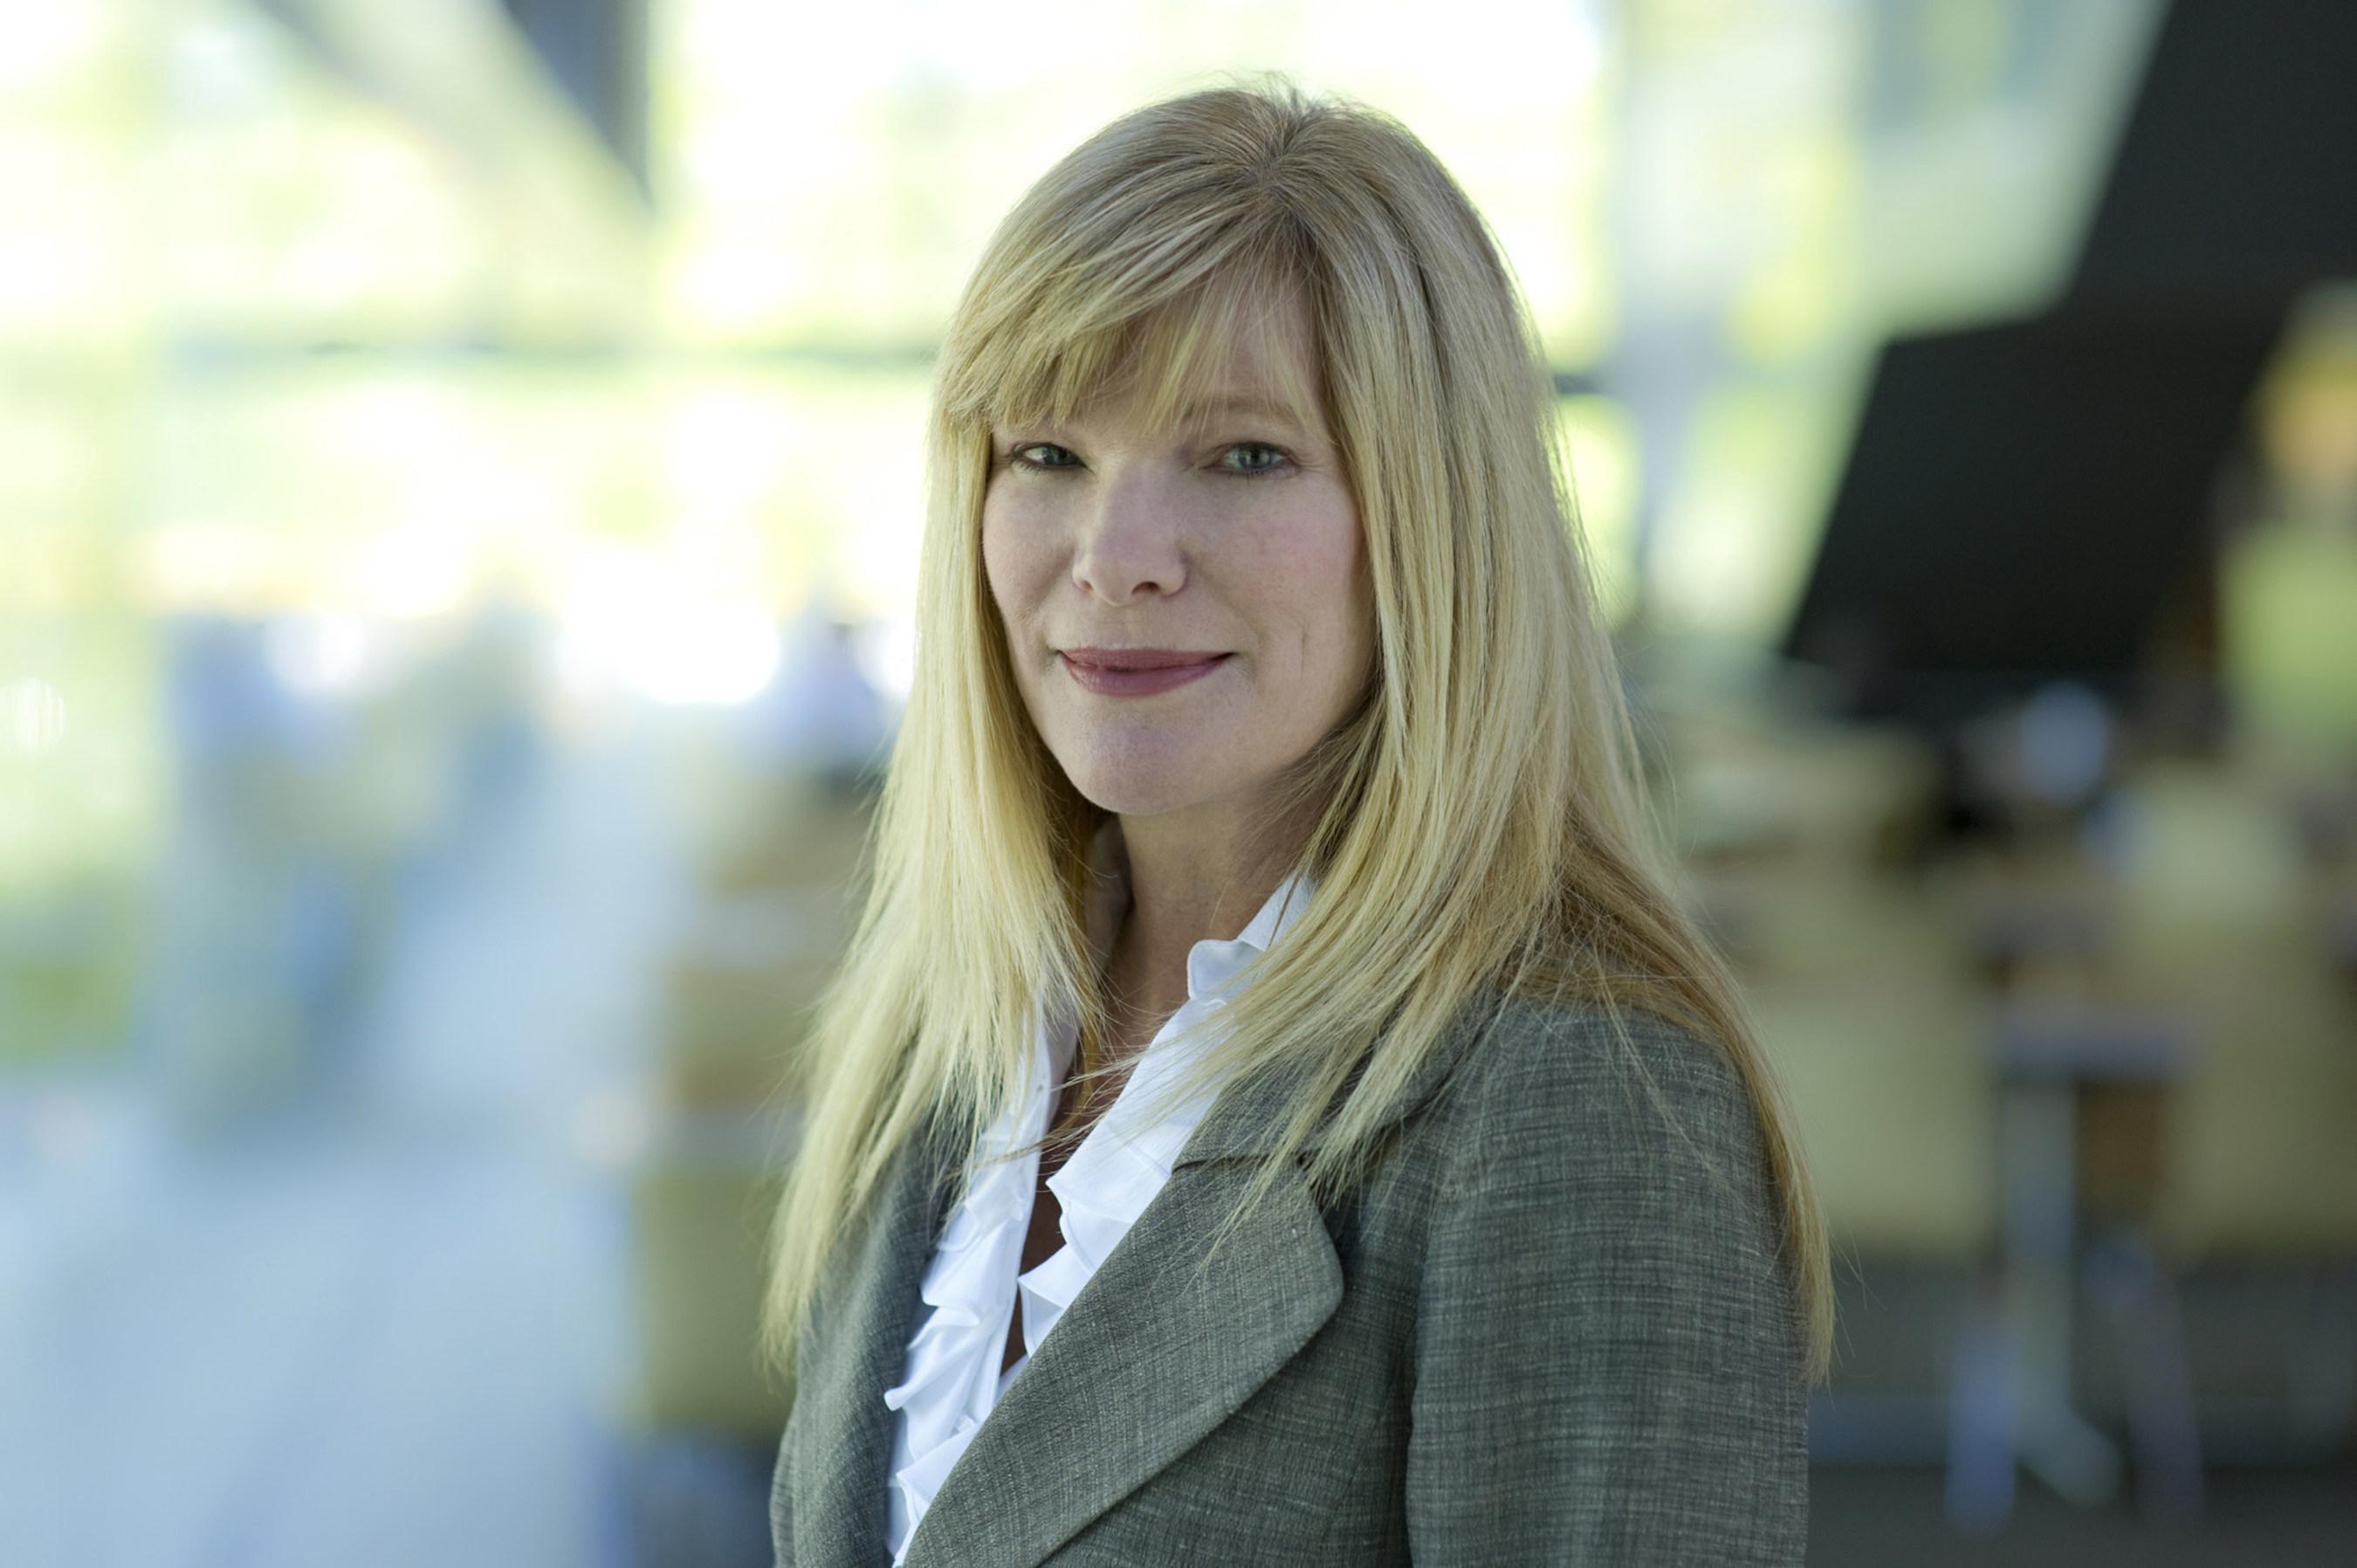 Long-tenured Vanguard municipal bond fund manager, Pamela Wisehaupt Tynan, to retire in February 2016.